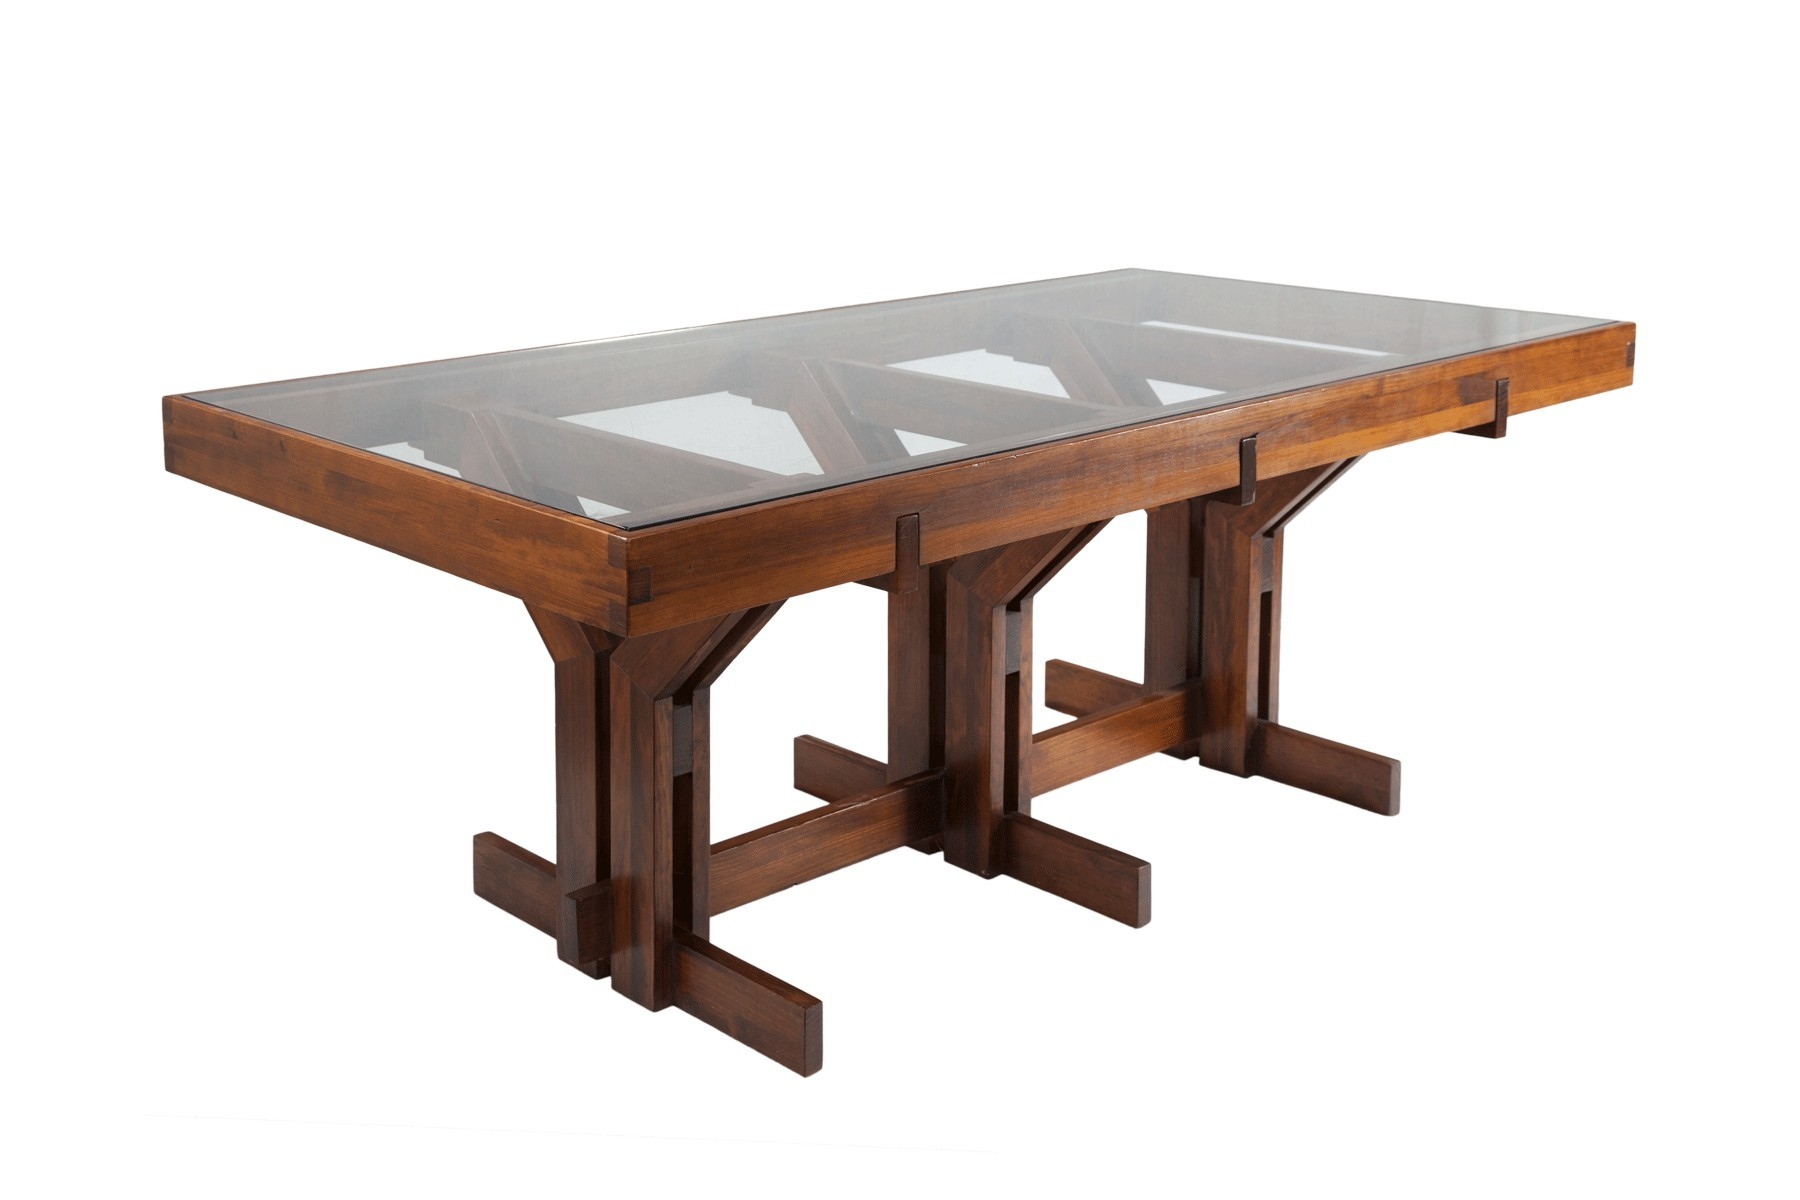 p_48-147-mesa-de-comedor-caballo-larga-de-200-x-100-x-75-cm